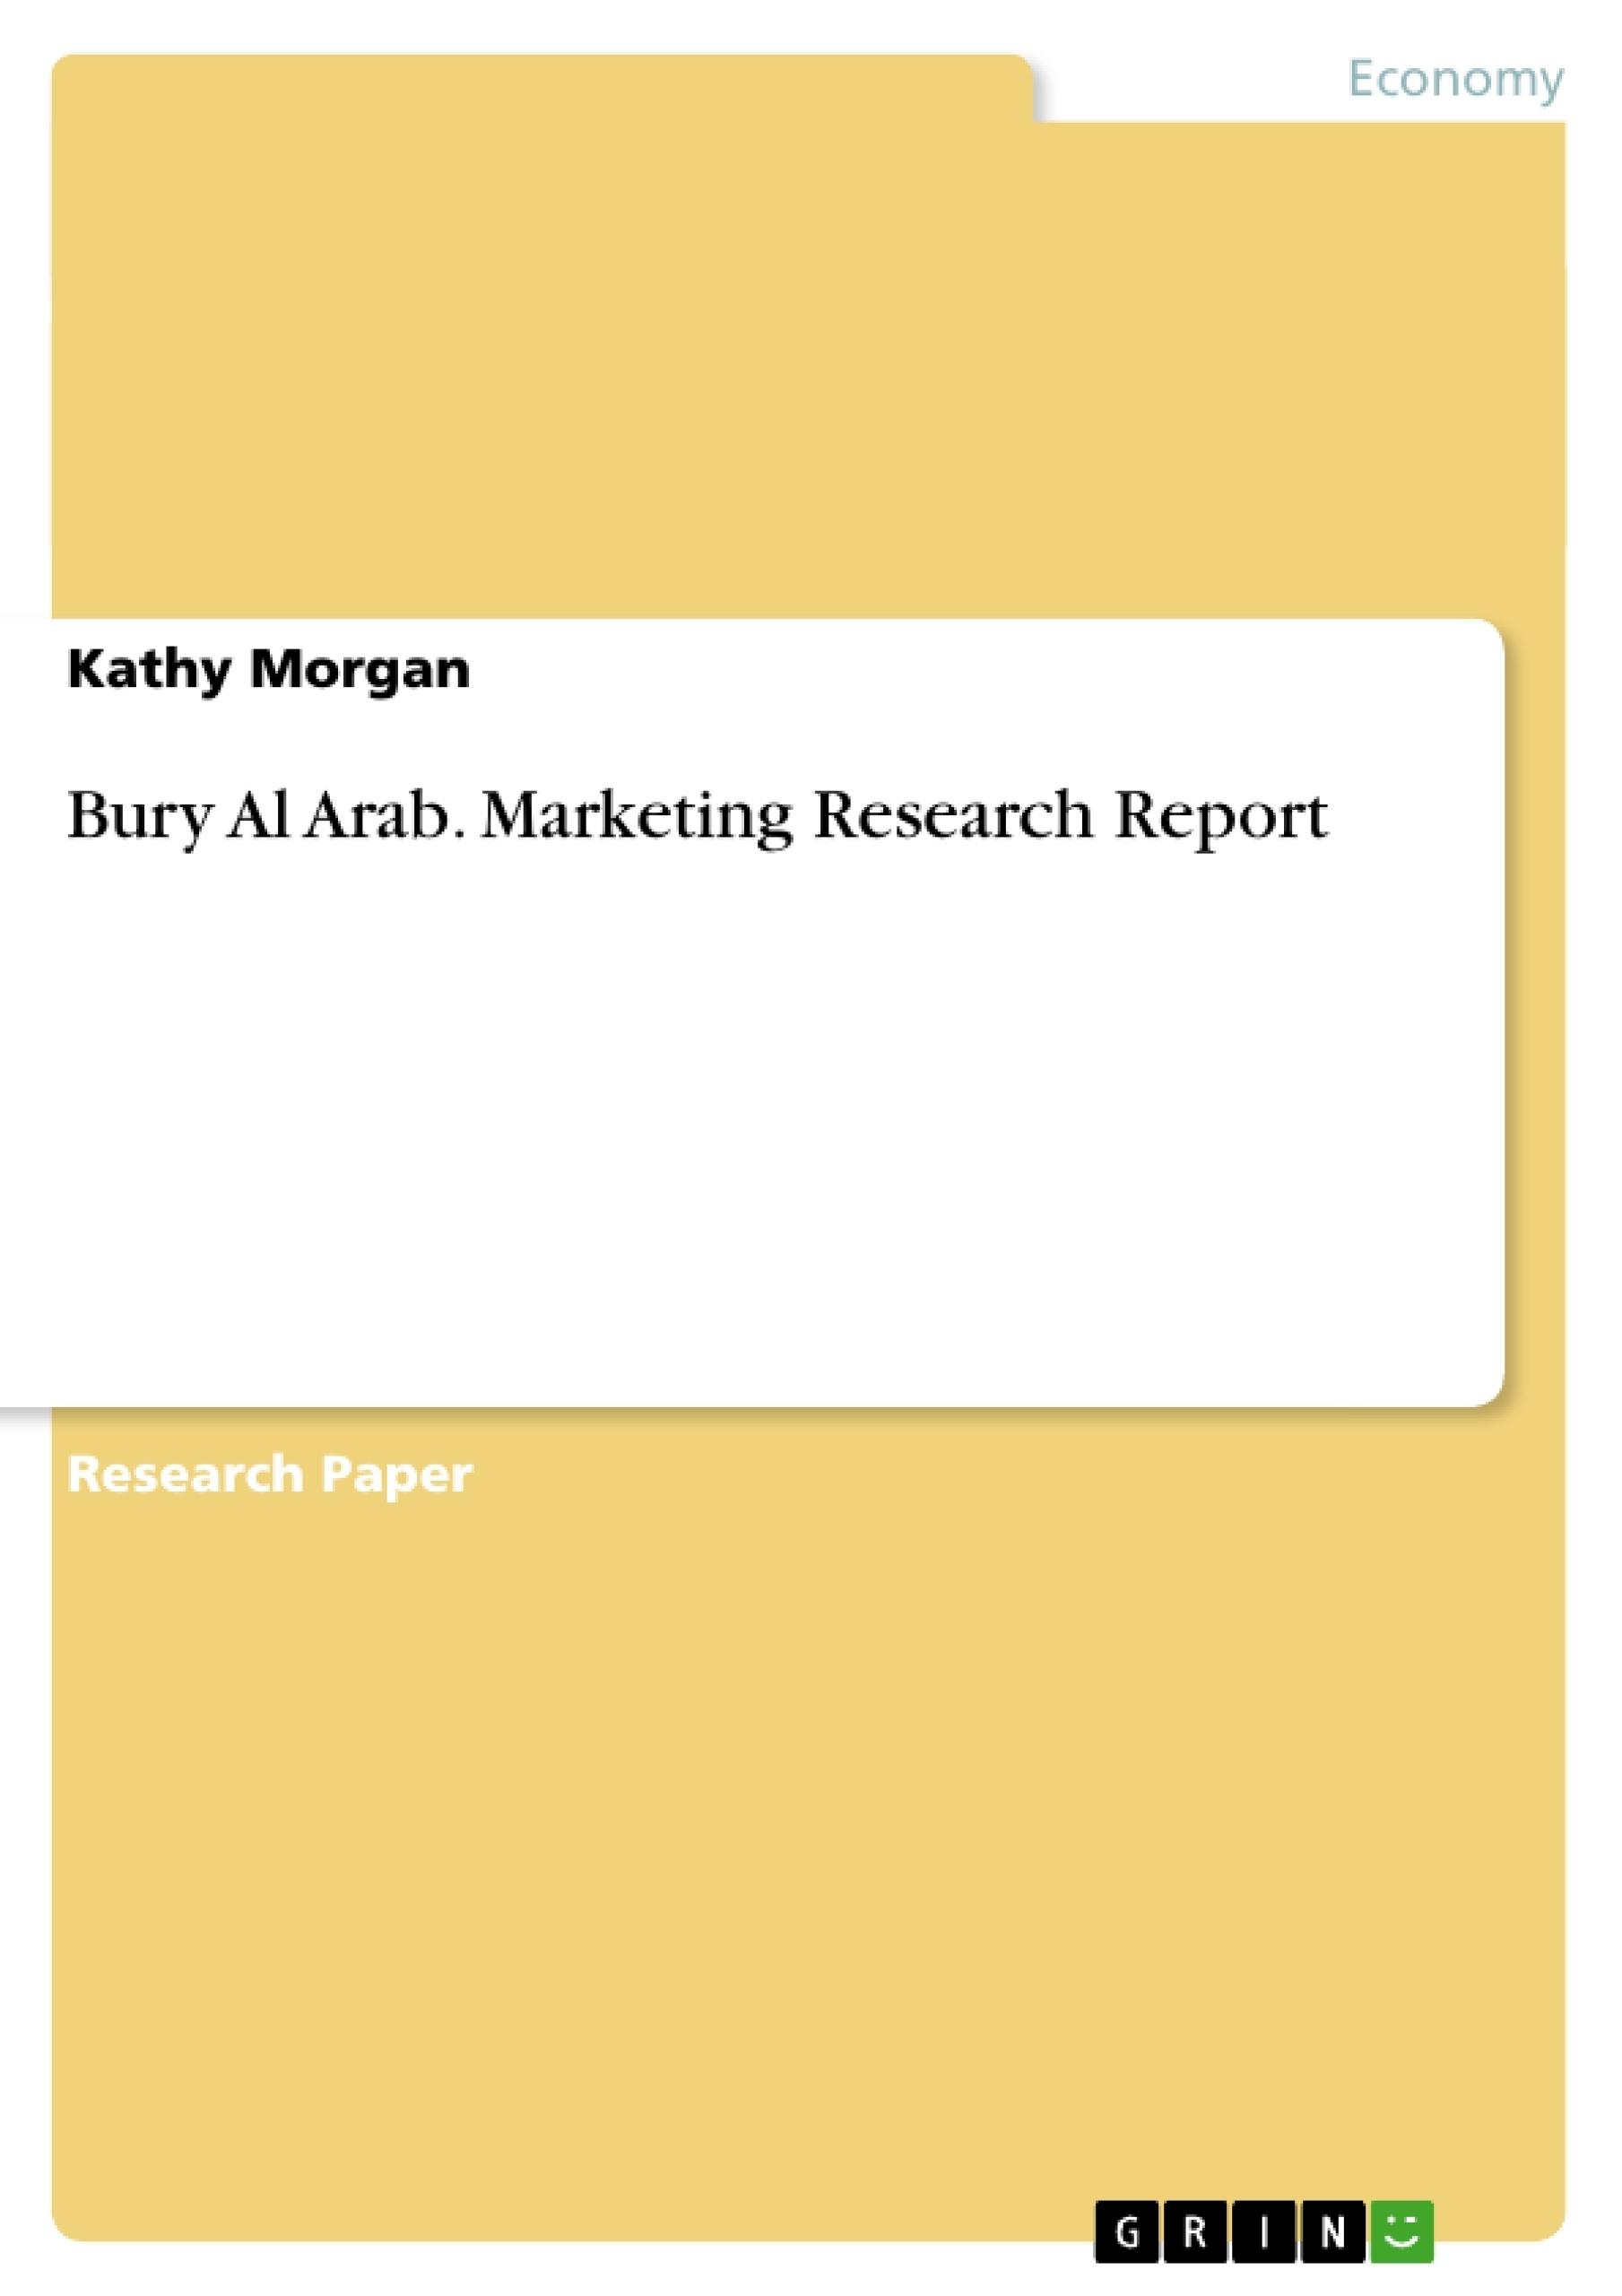 Title: Bury Al Arab. Marketing Research Report